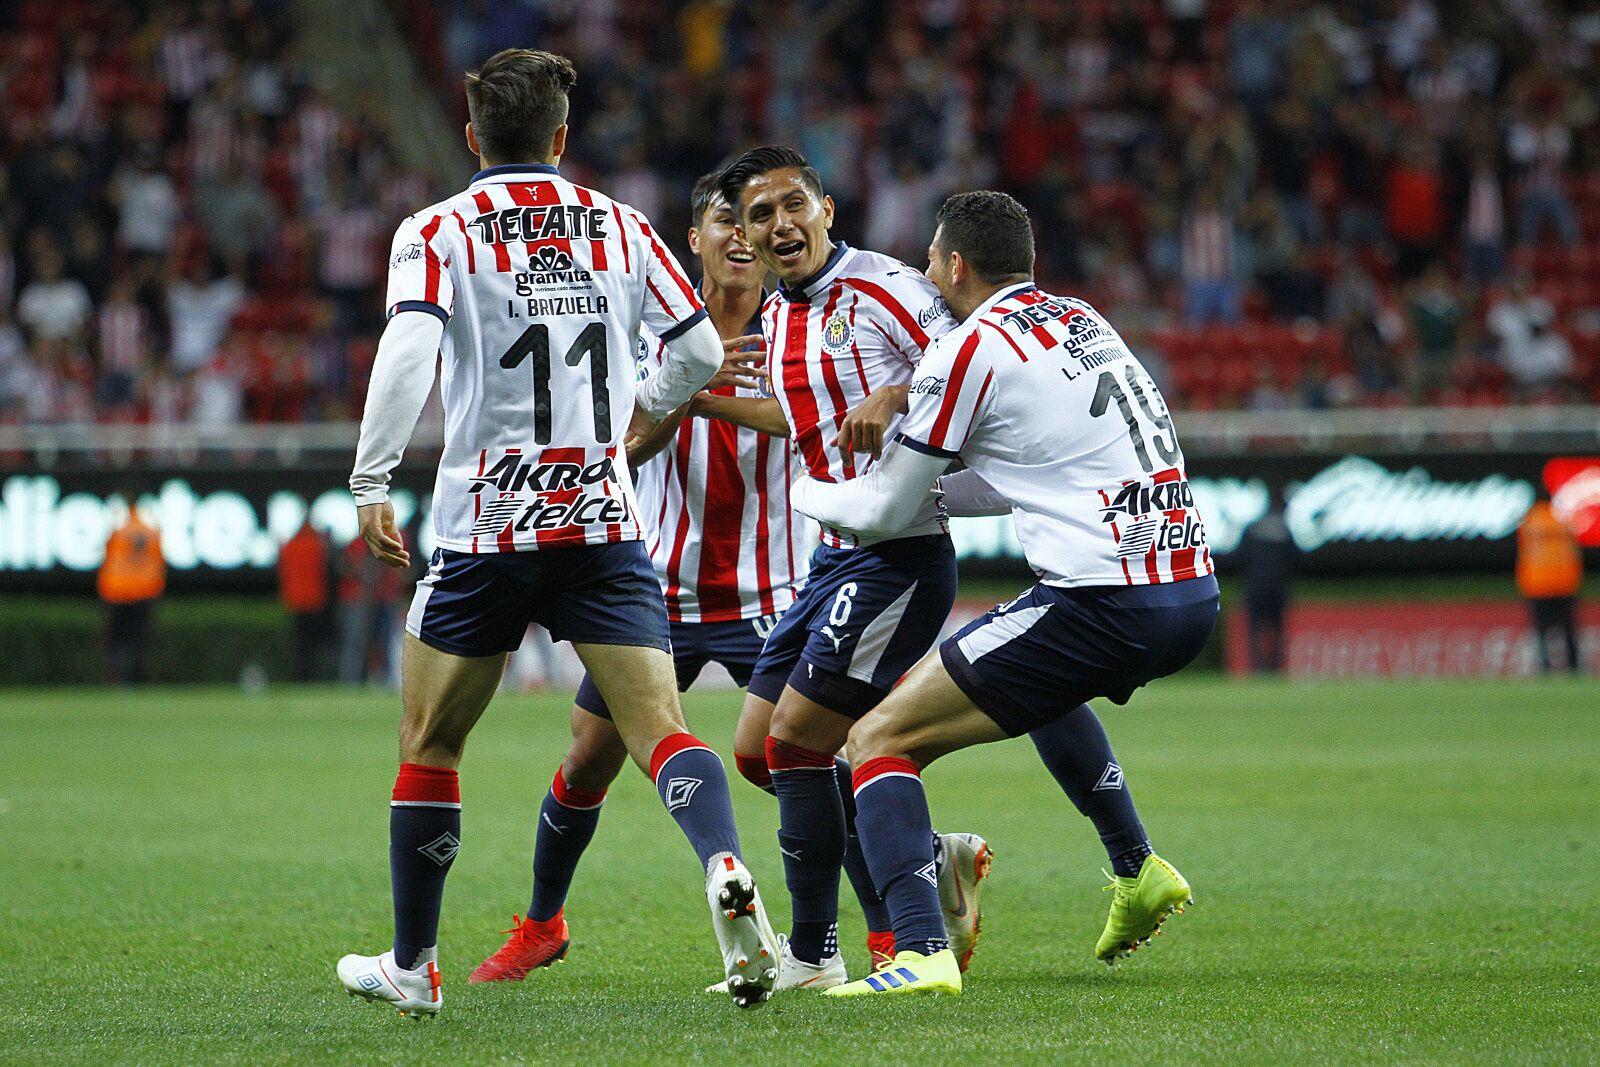 Chivas overcome feisty Atlético San Luis to force Super Clásico ddfde4906bf7c